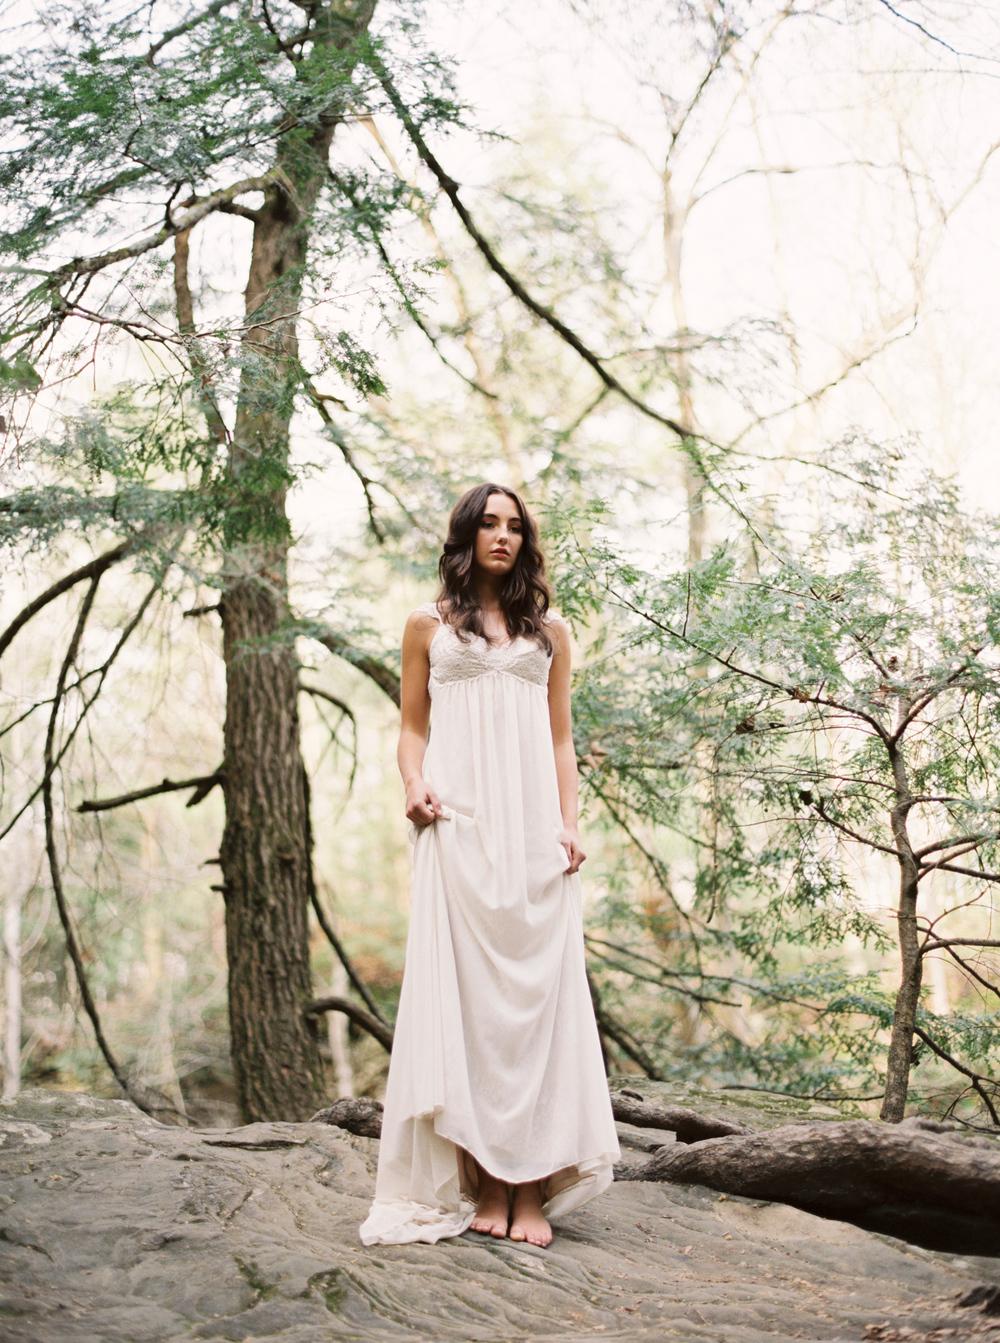 Kyle John l Fine Art Wedding Photography l Chicago, Copenhagen, California, New York, Destination l Blog l AK_23